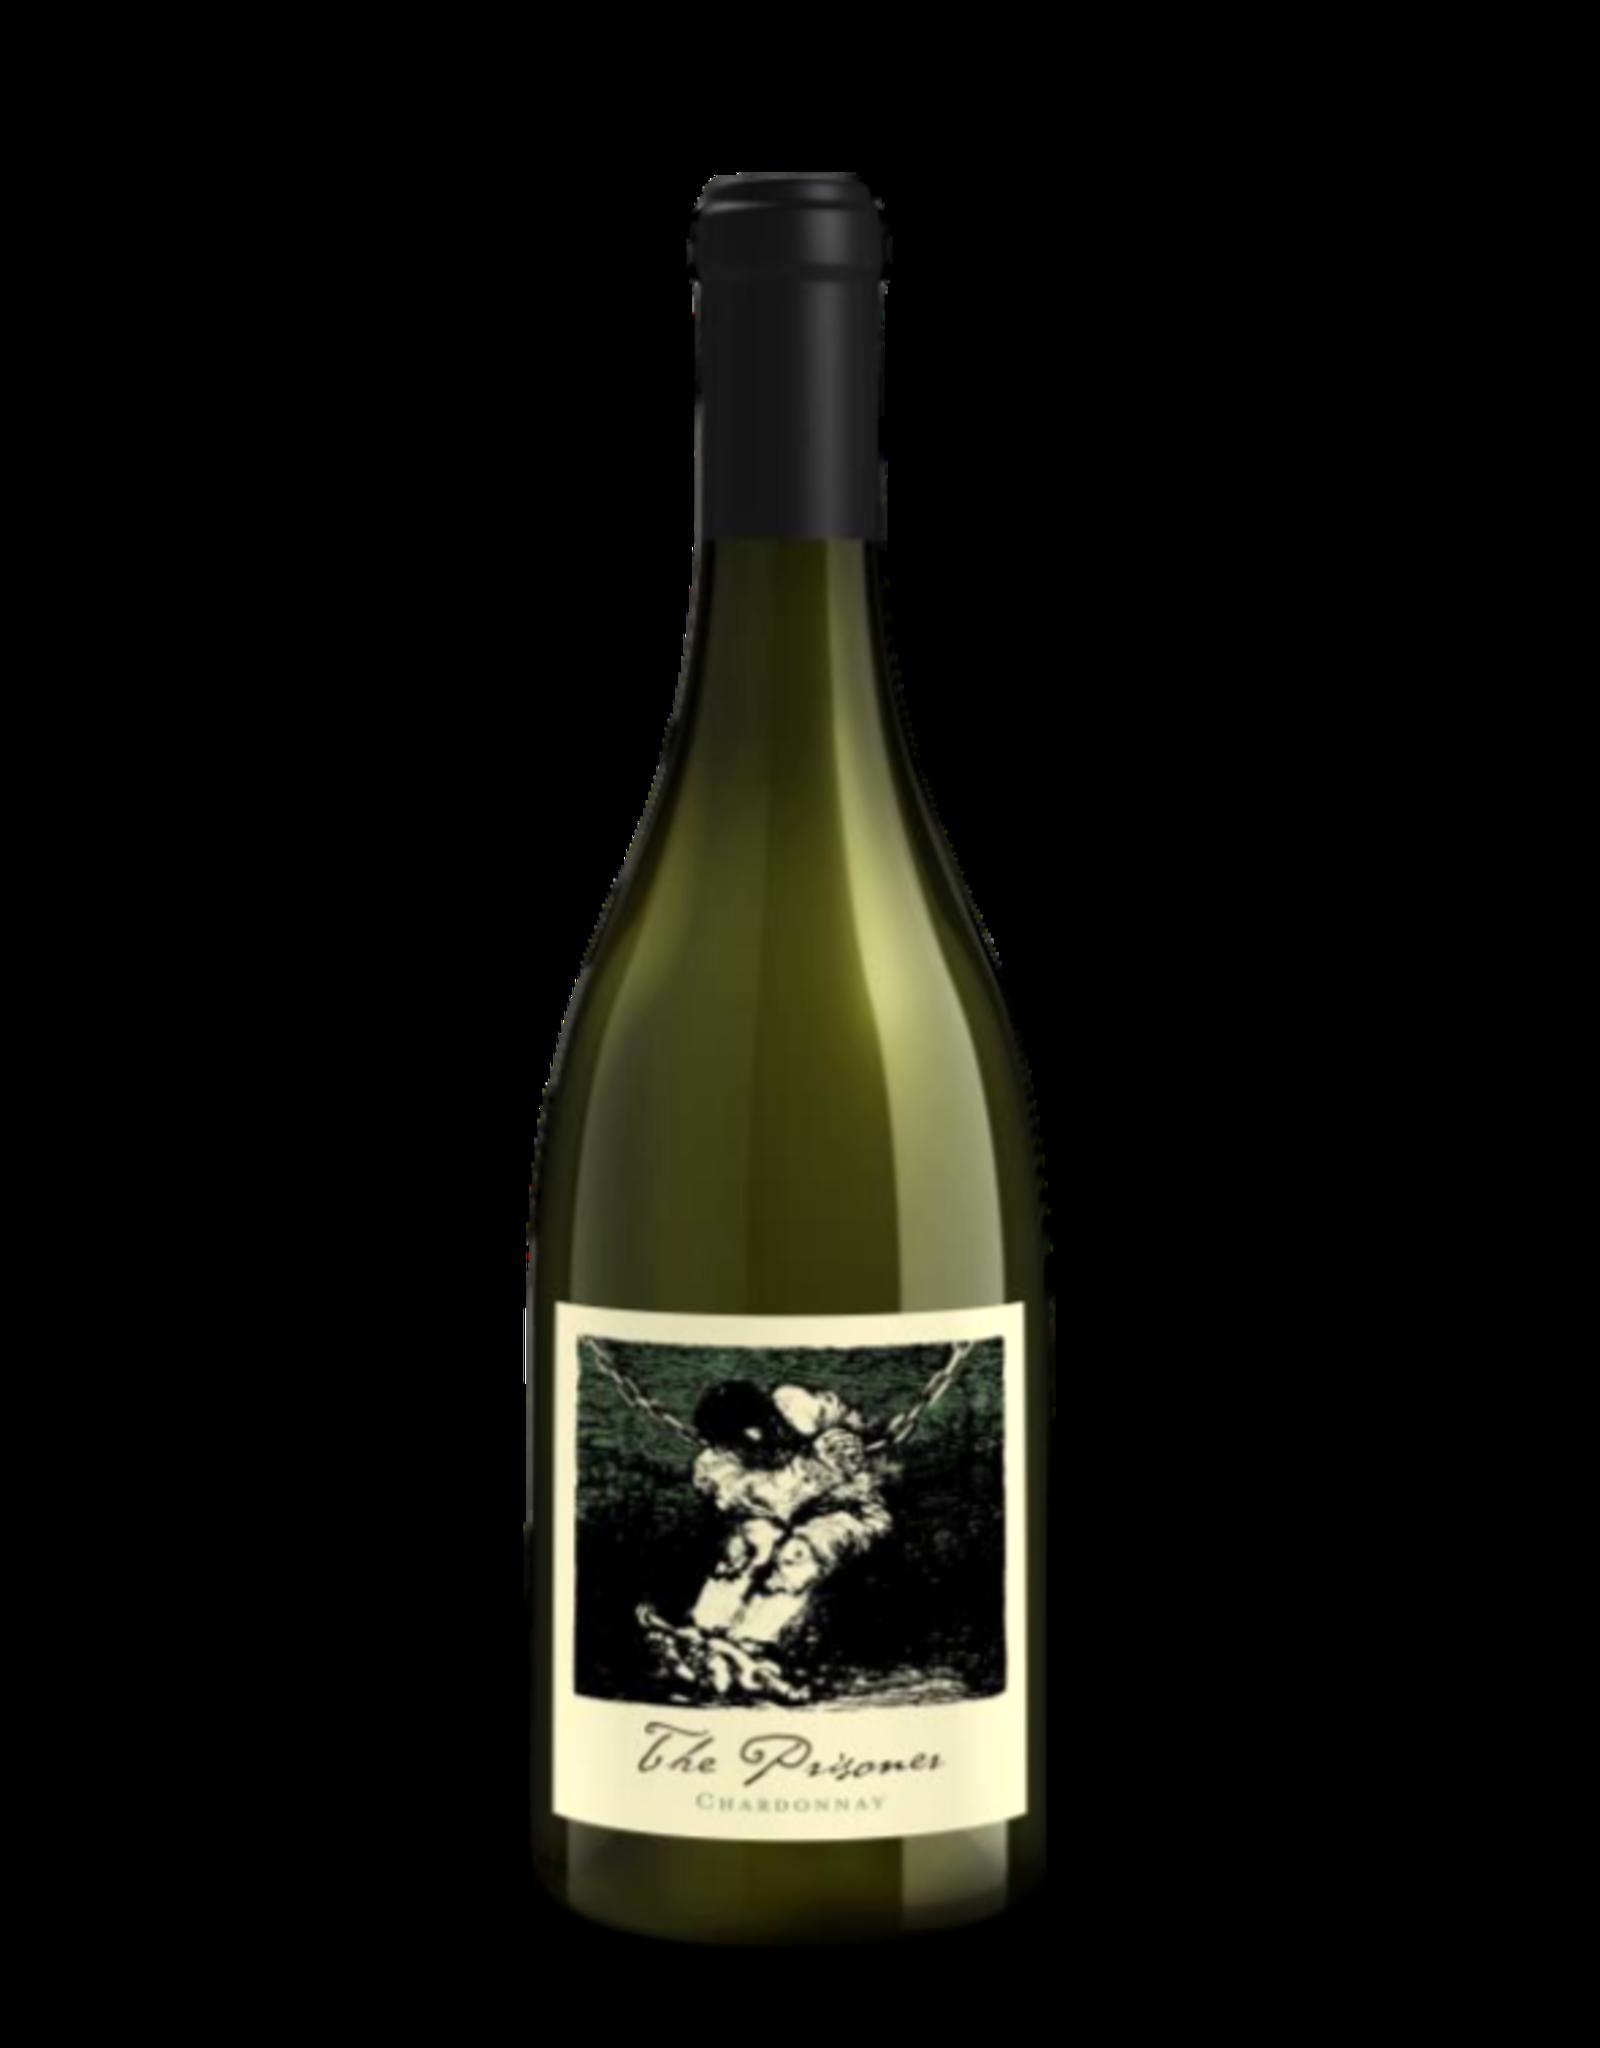 The Prisoner Chardonnay 2019